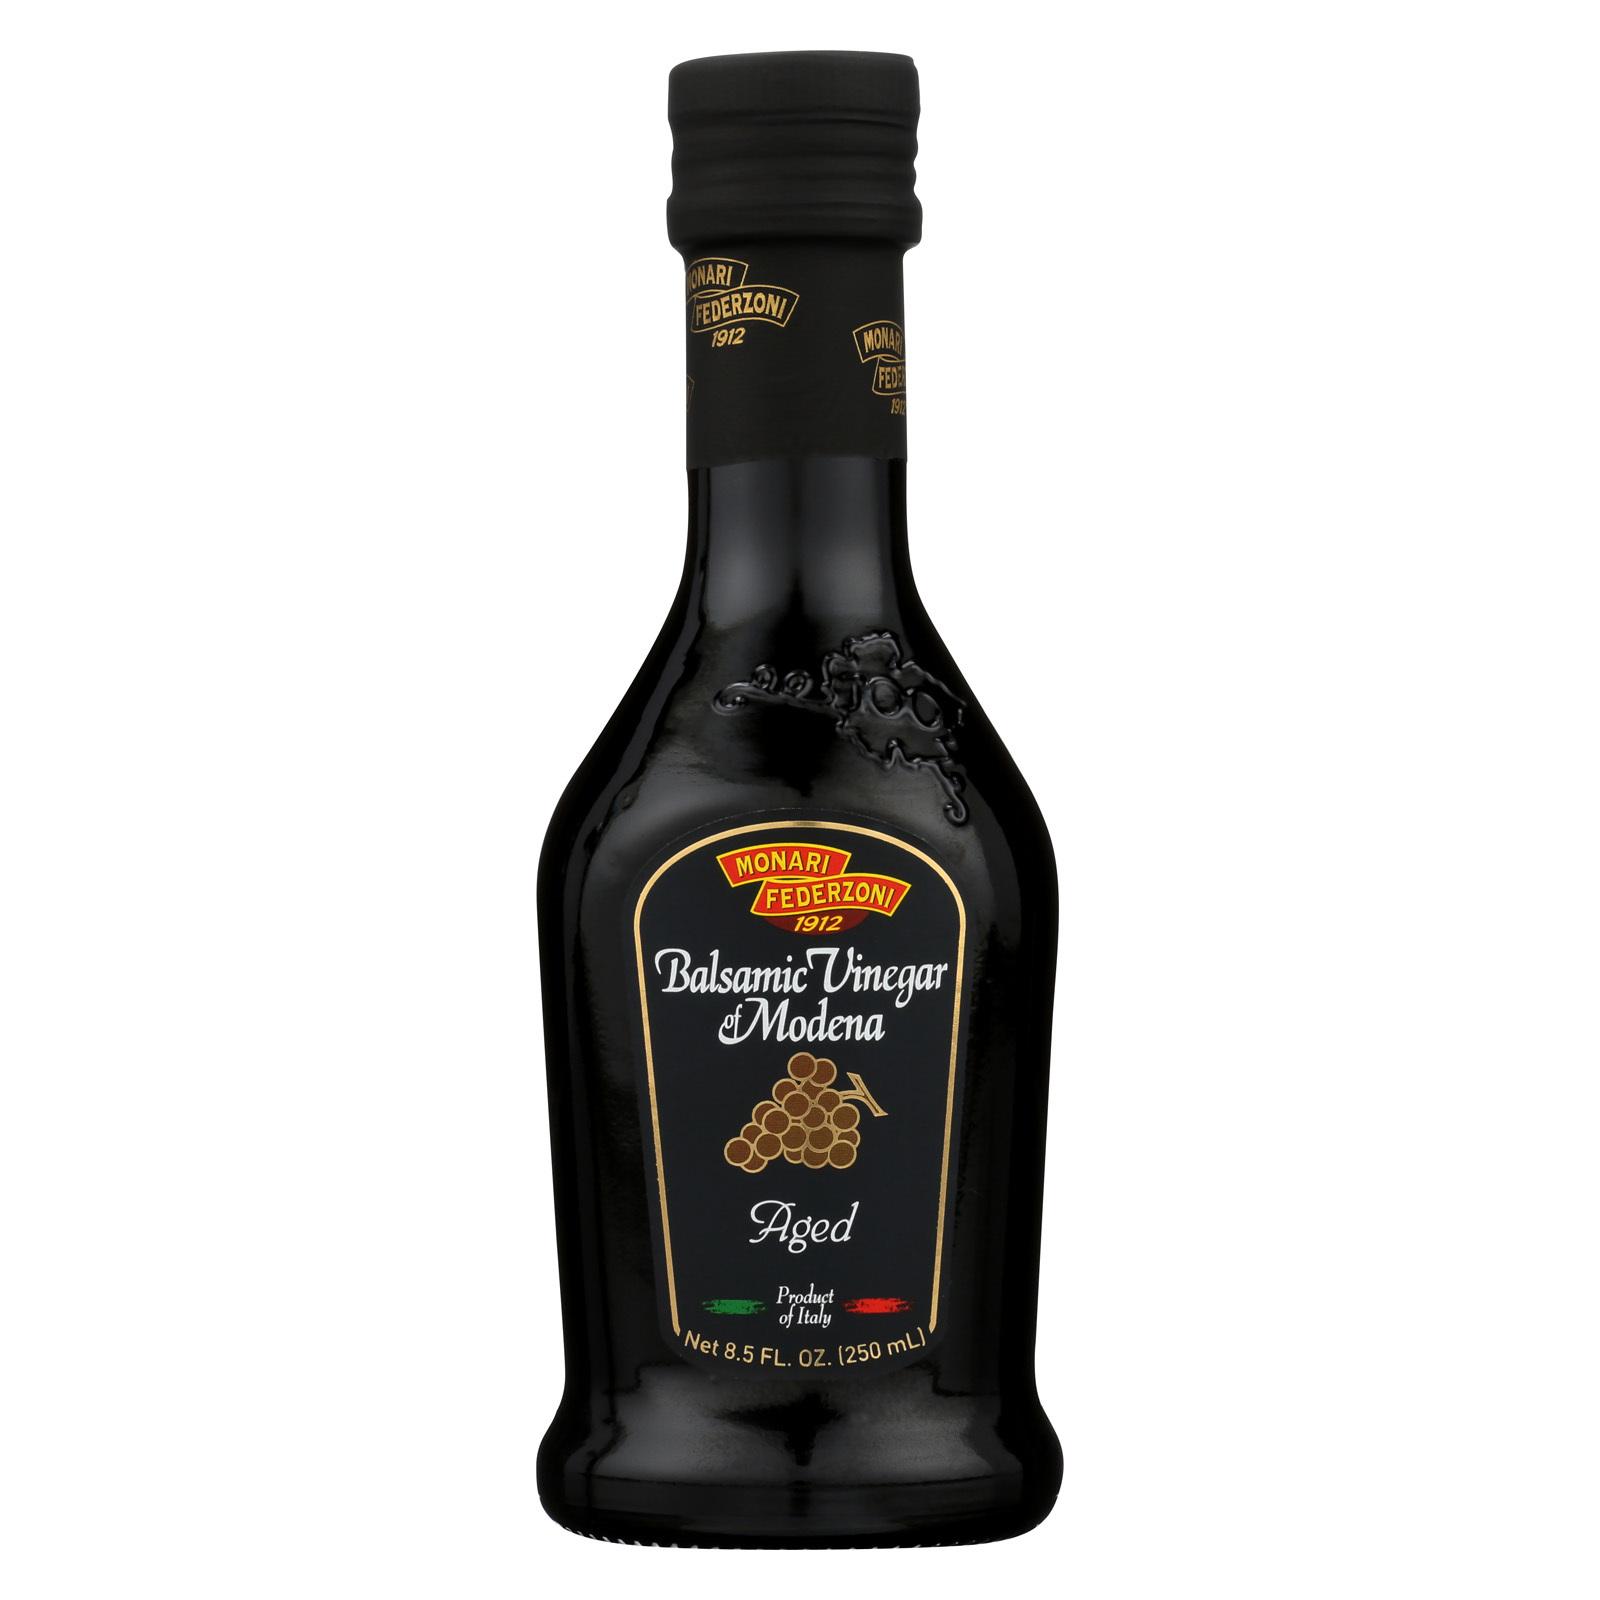 Monari Federzoni Balsamic Vinegar of Modena - Gold Label - Case of 6 - 8.5 Fl oz.